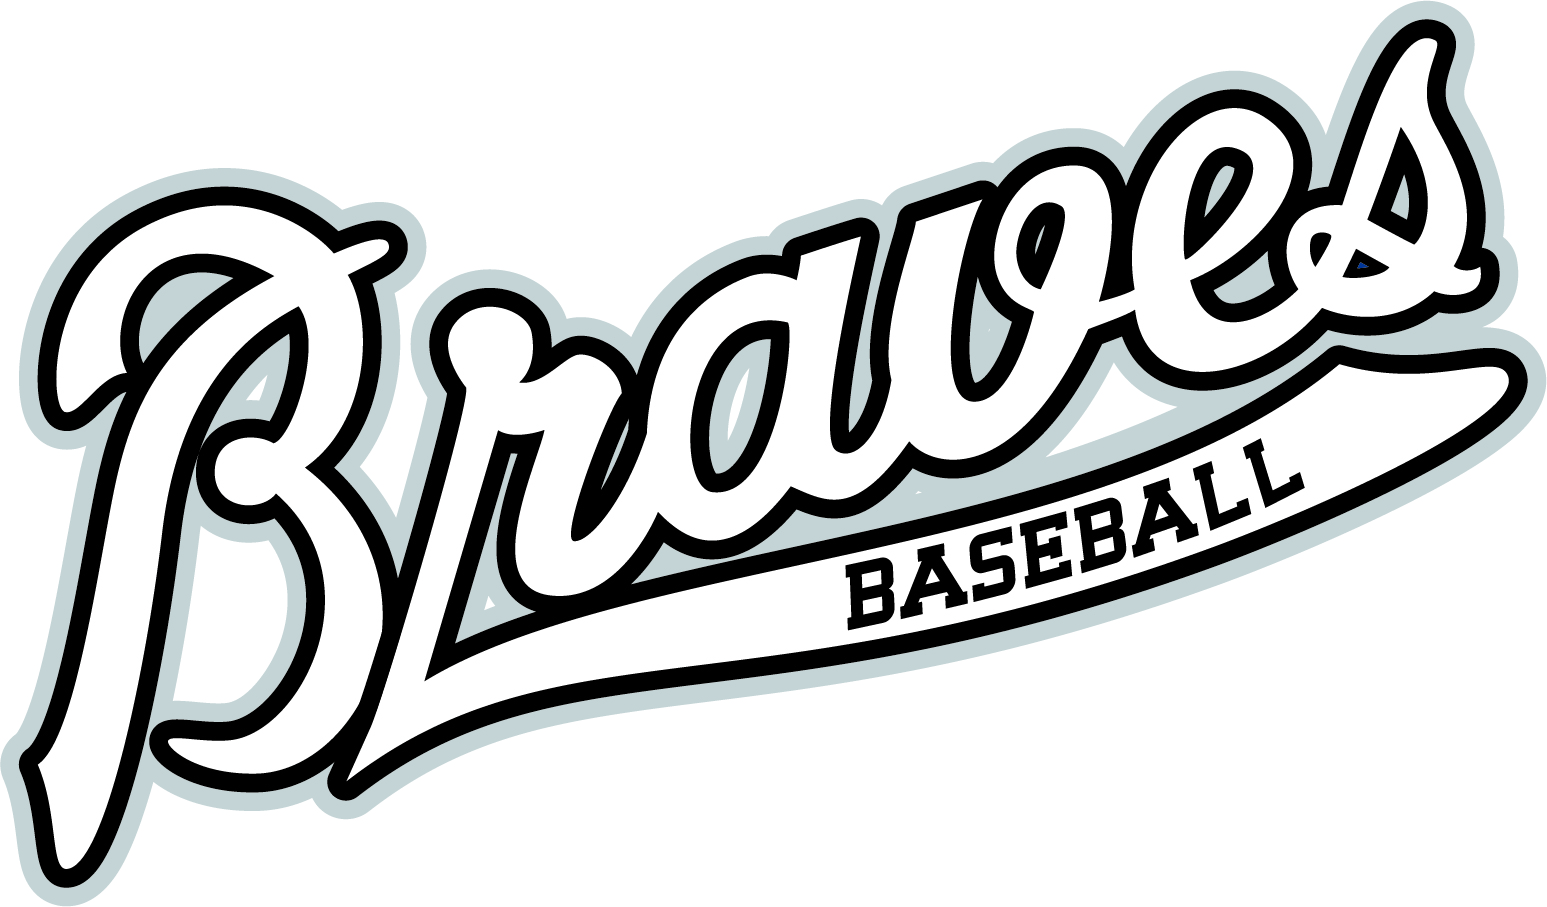 Burr Ridge Braves